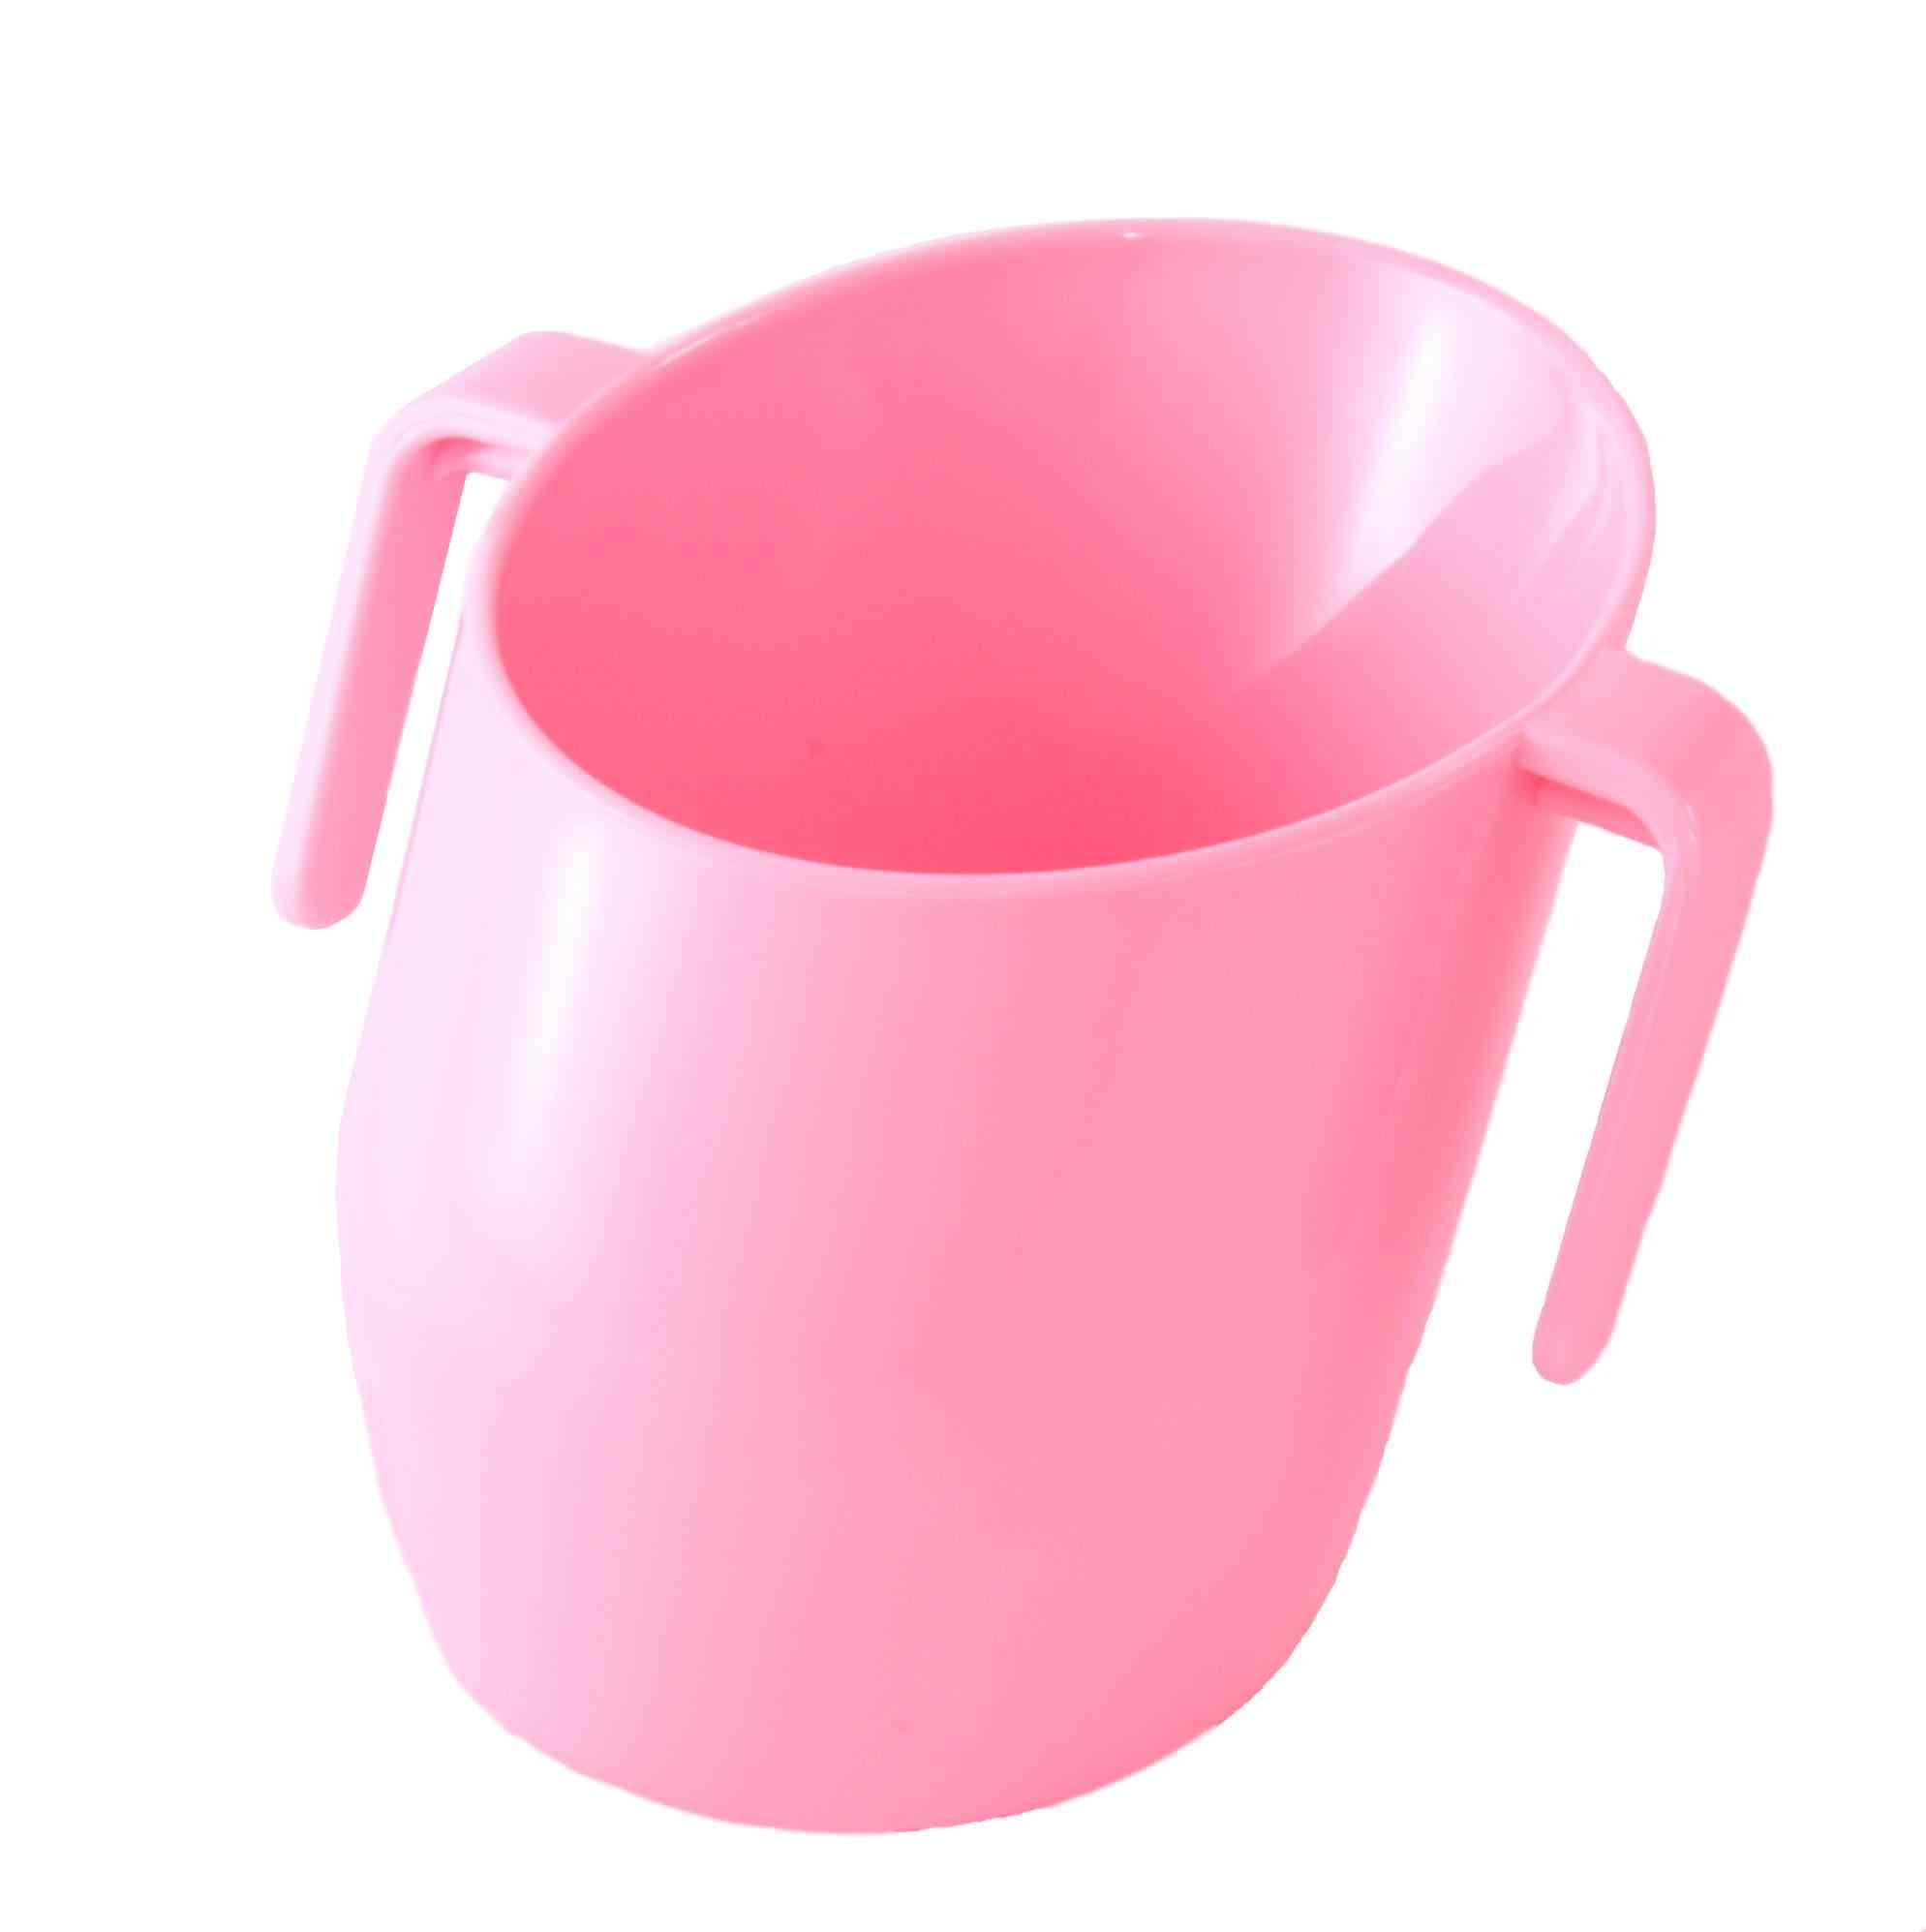 Pink-Doidy-compressed.jpg